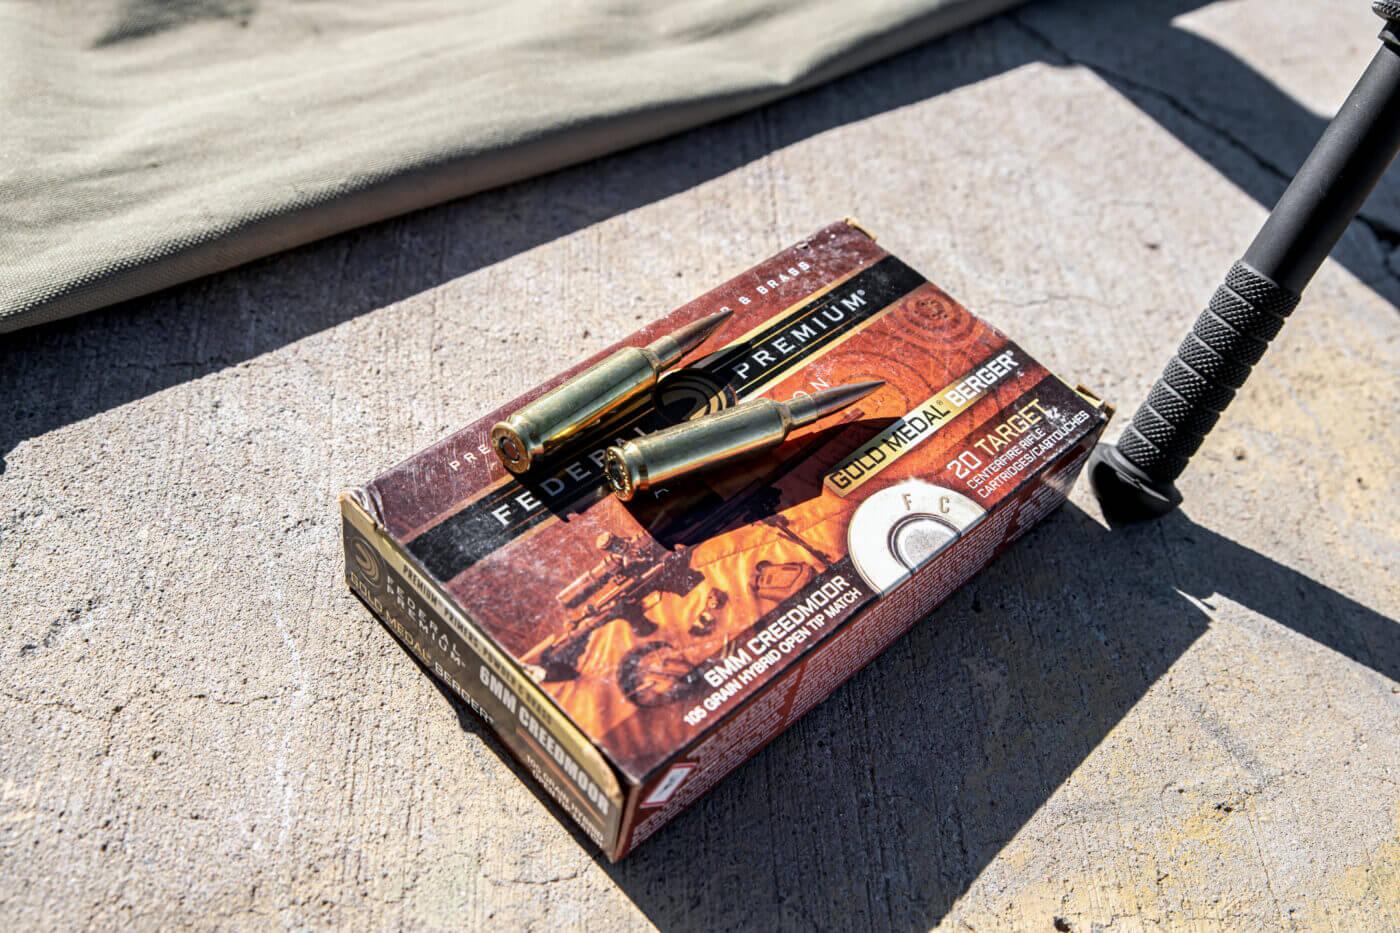 Federal 105-gr. Gold Medal Berger 6mm Creedmoor ammo